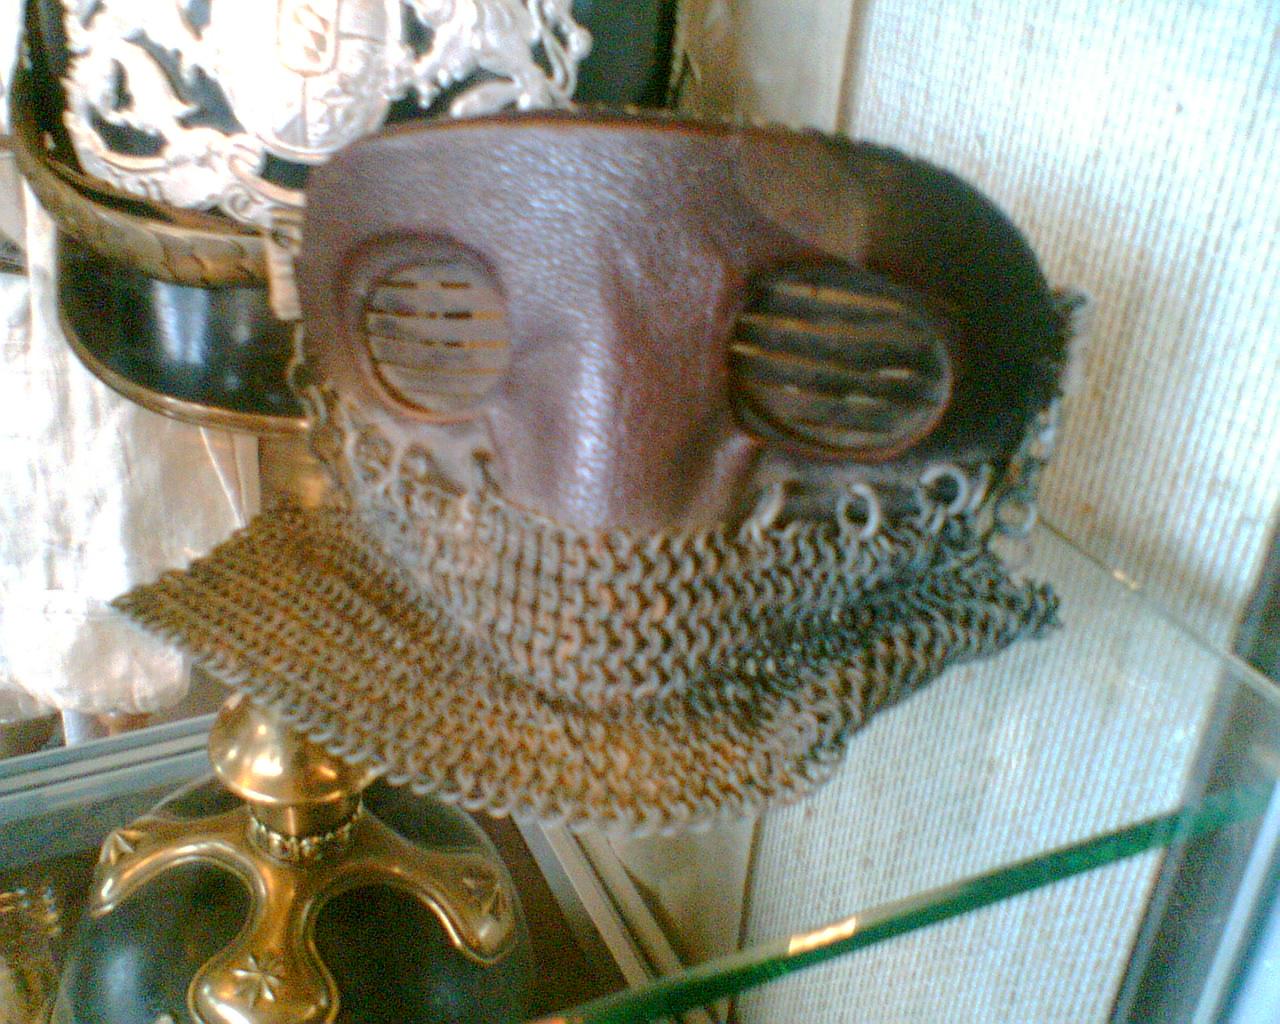 http://upload.wikimedia.org/wikipedia/commons/4/41/Tank_Mask_WWI.jpg